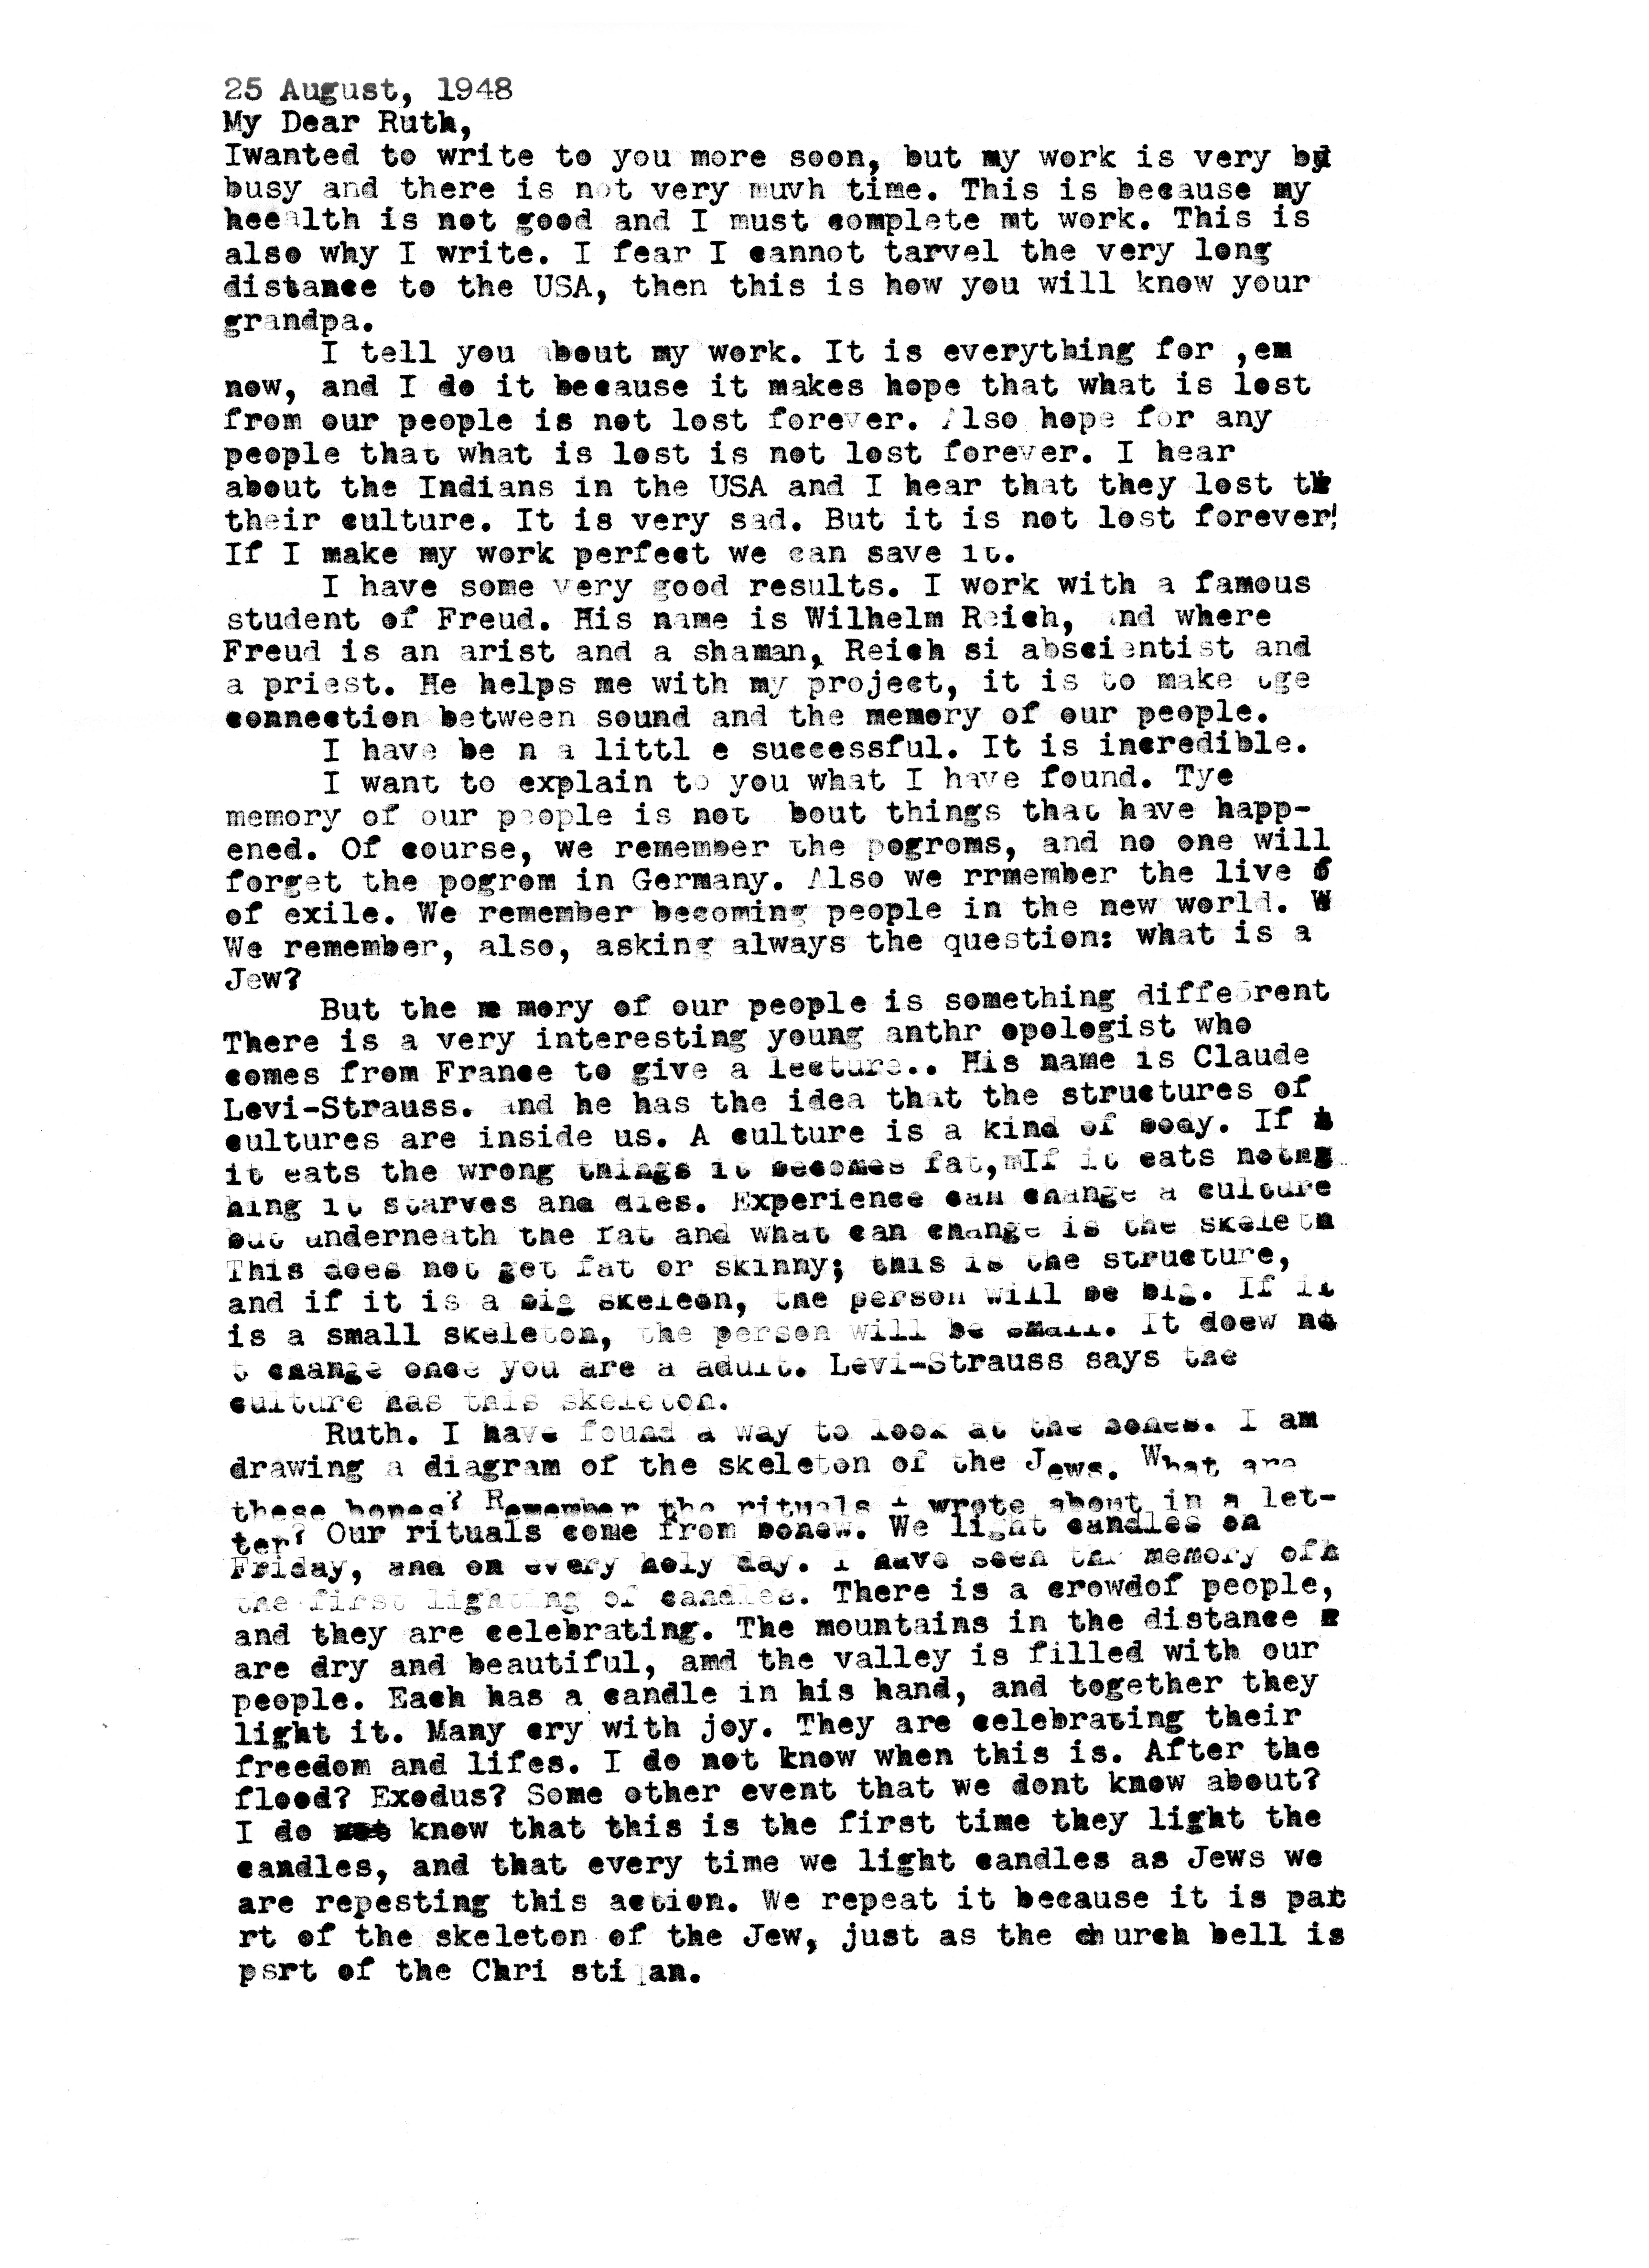 Gerchunoff Letter 2